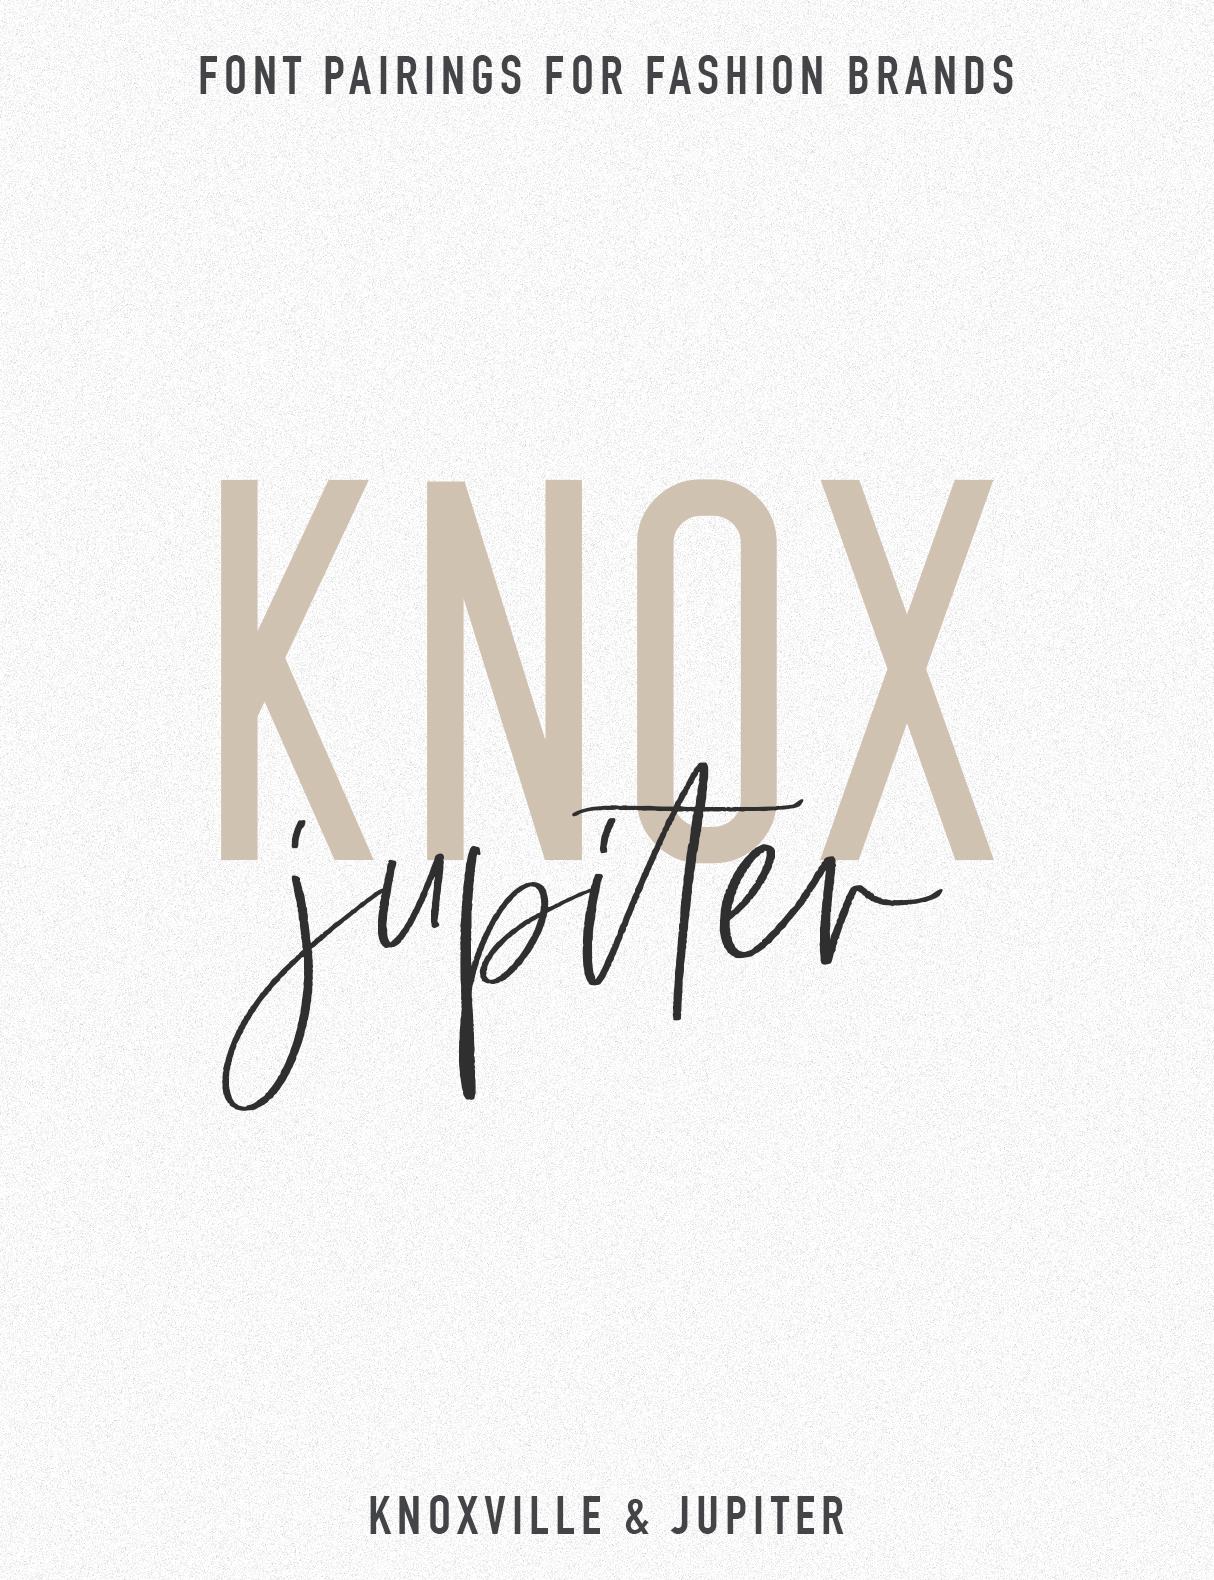 Jen Wagner Fashion Brand Font Pairings | Knoxville Jupiter.jpg